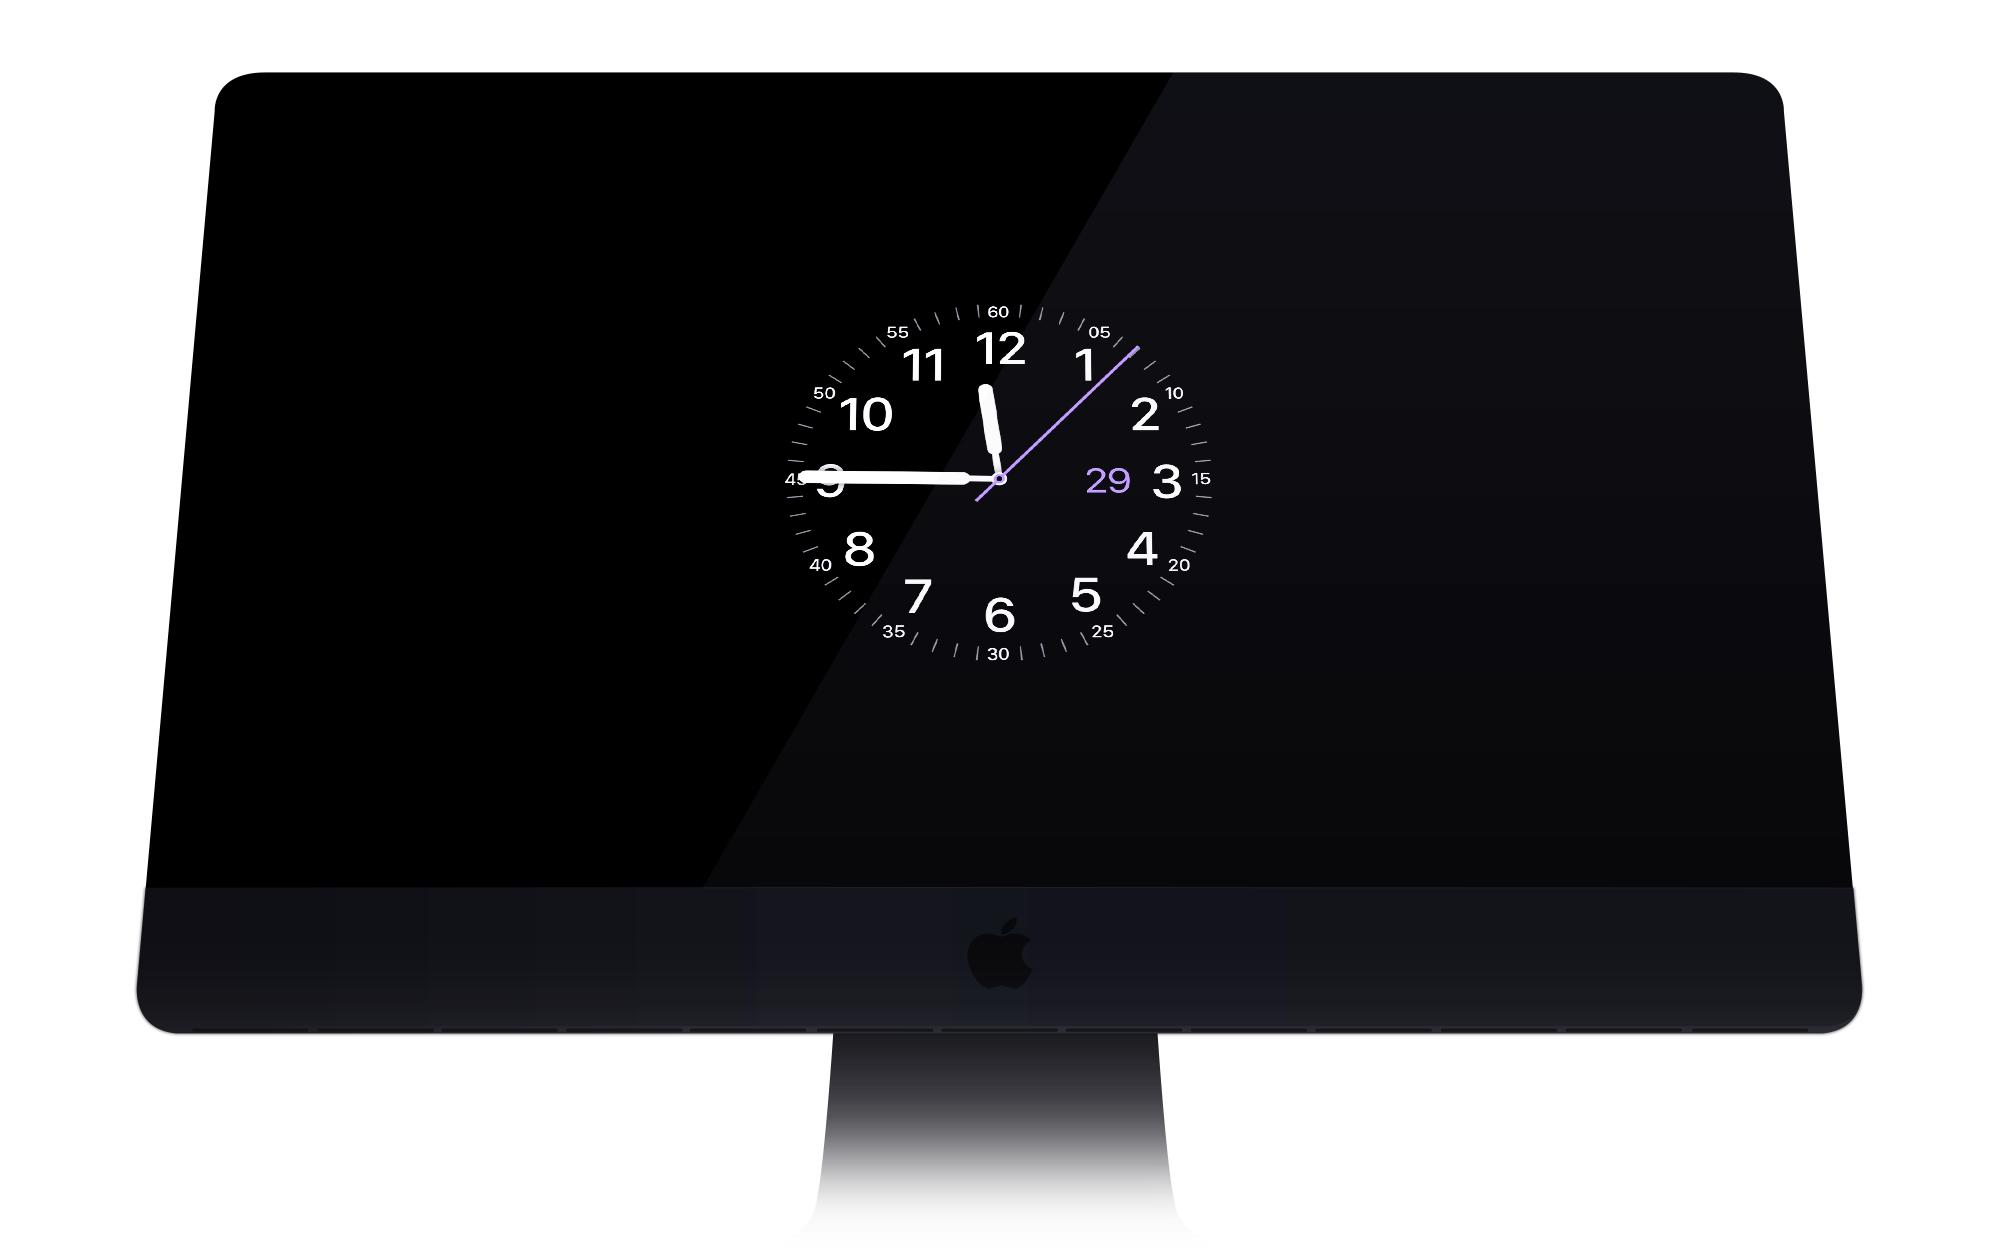 Watch OS X Bildschirmschoner